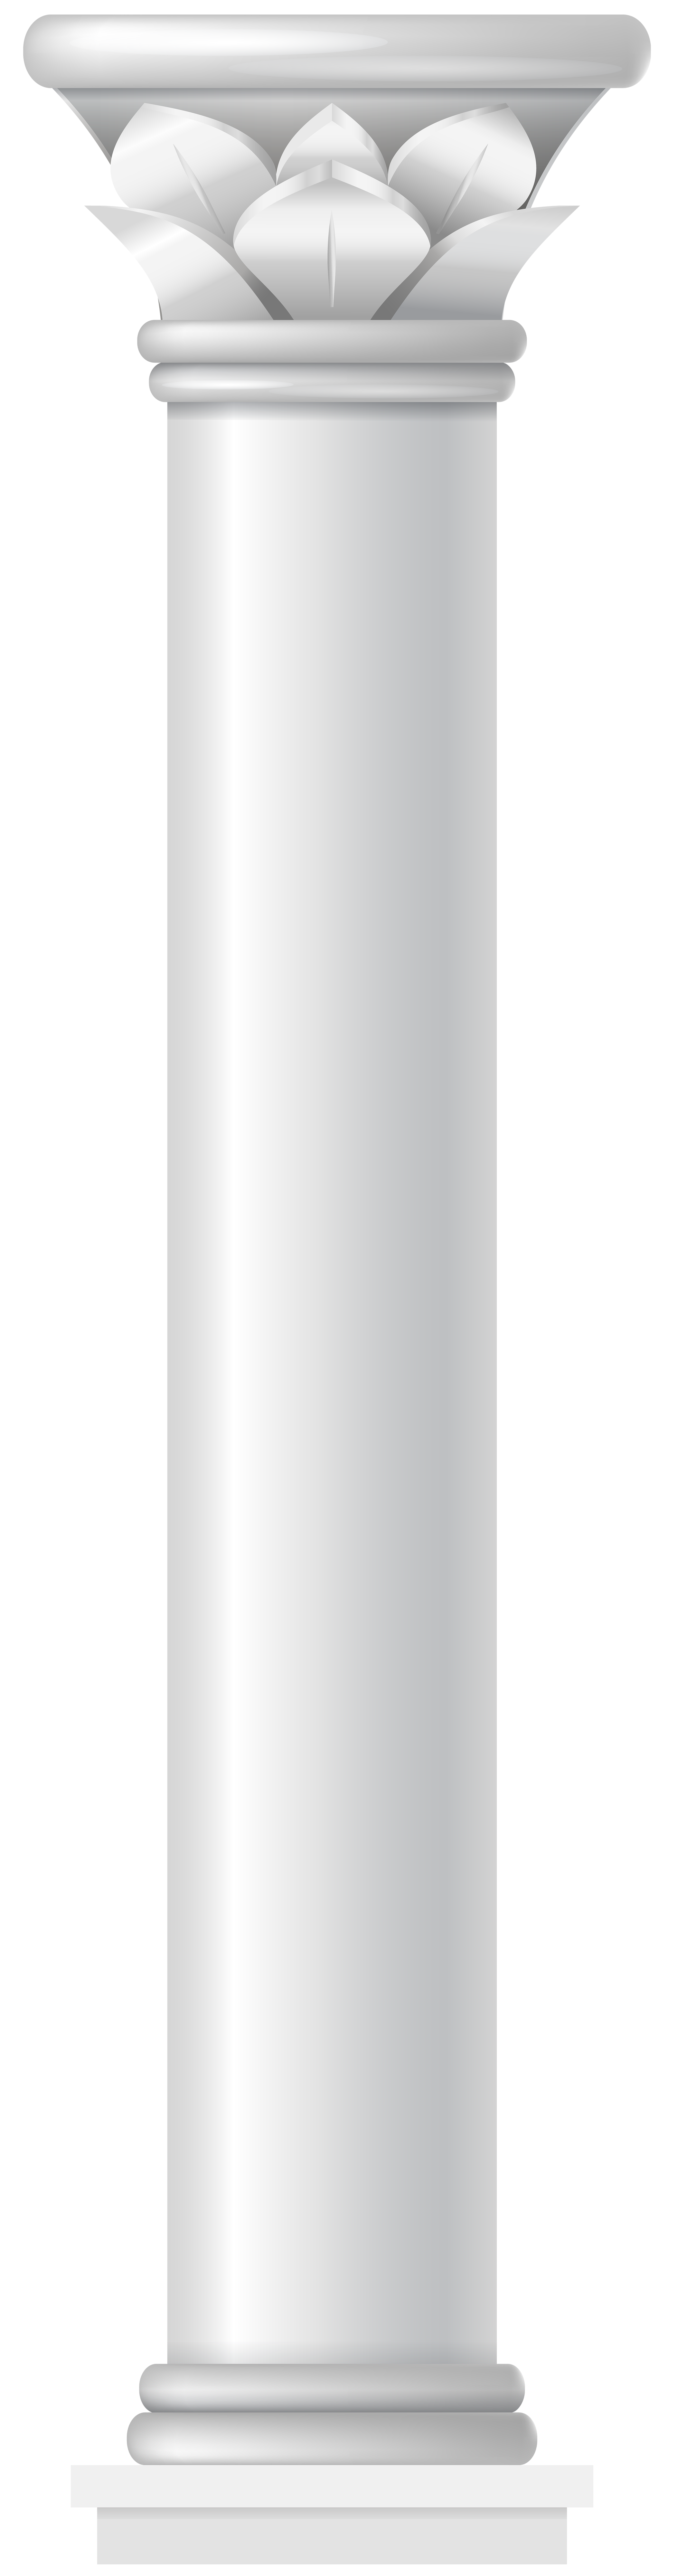 Png transparent clip art. Column clipart pillar